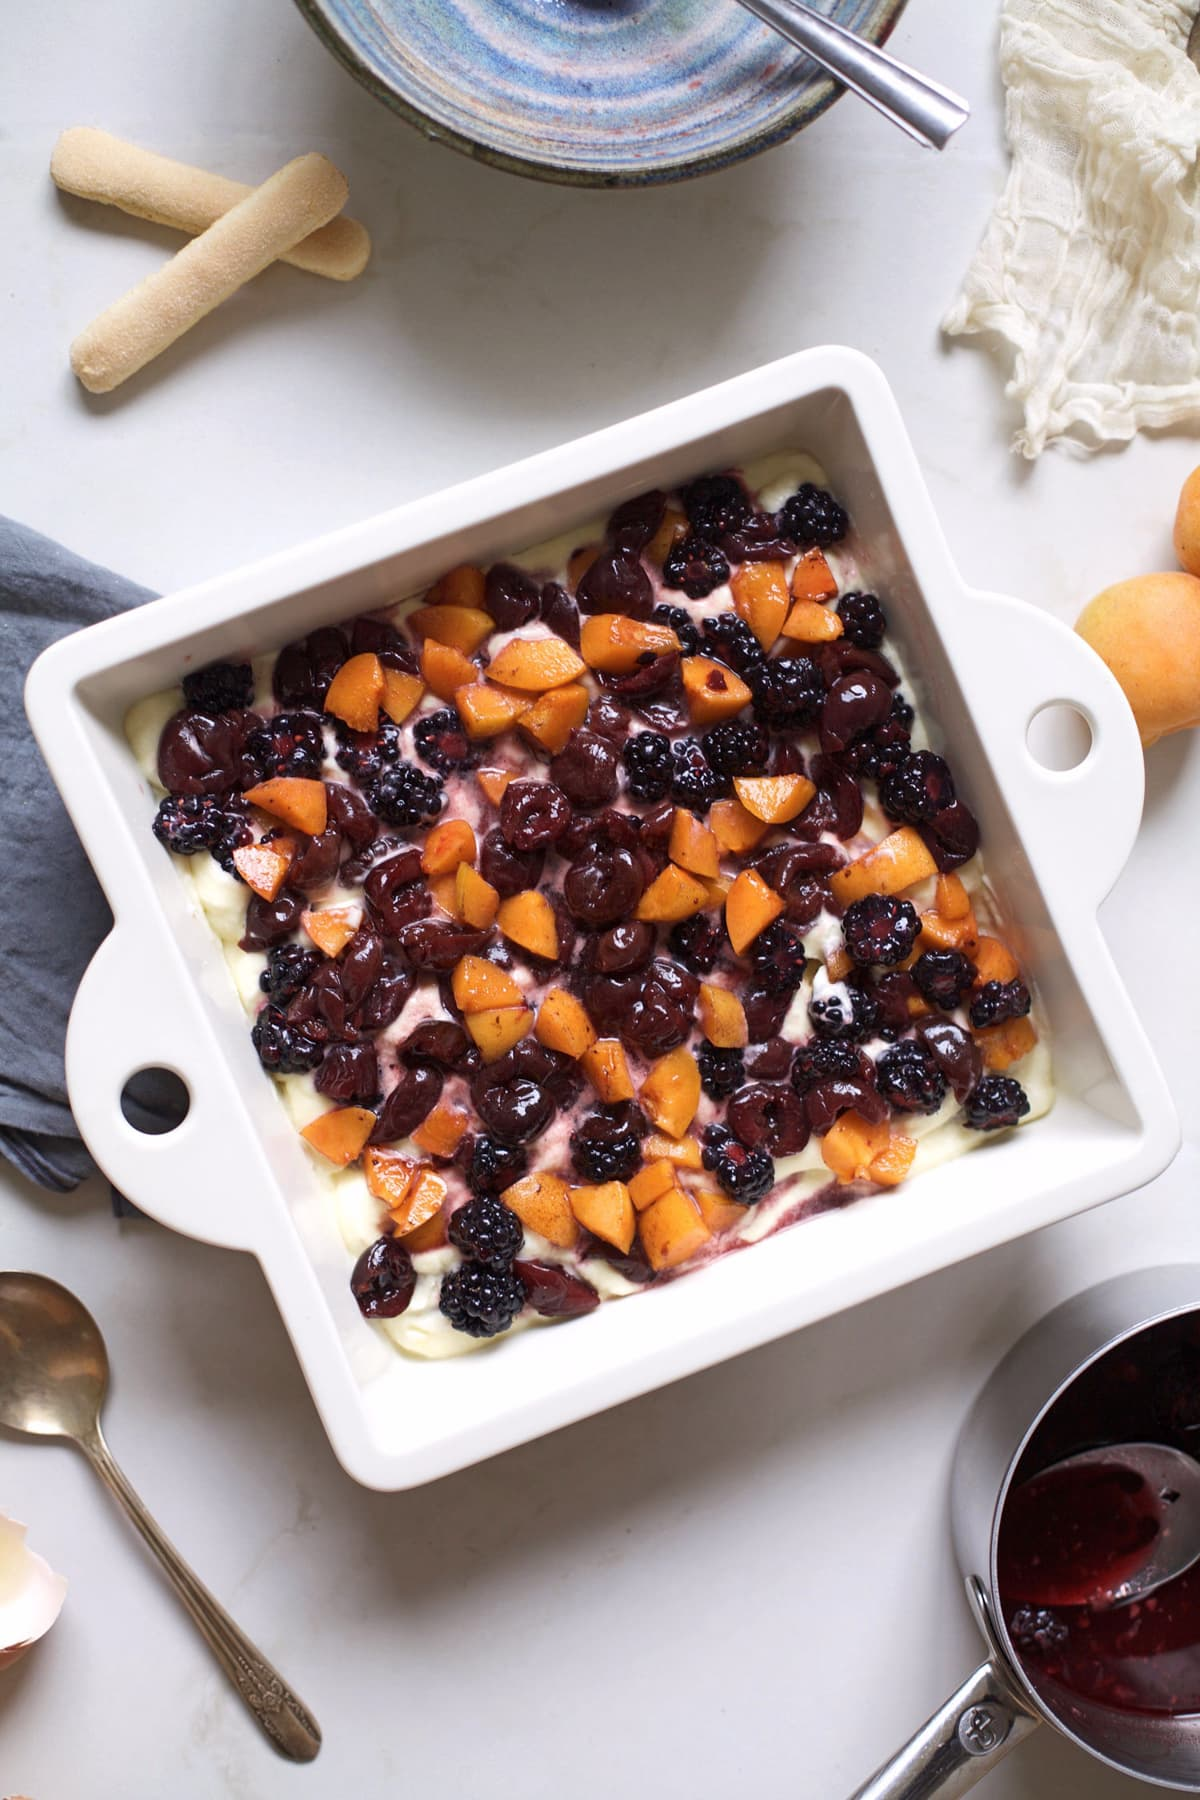 summer fruit tiramisu-Sugar & Cloth - Recipe - Houston Blogger - Cakes